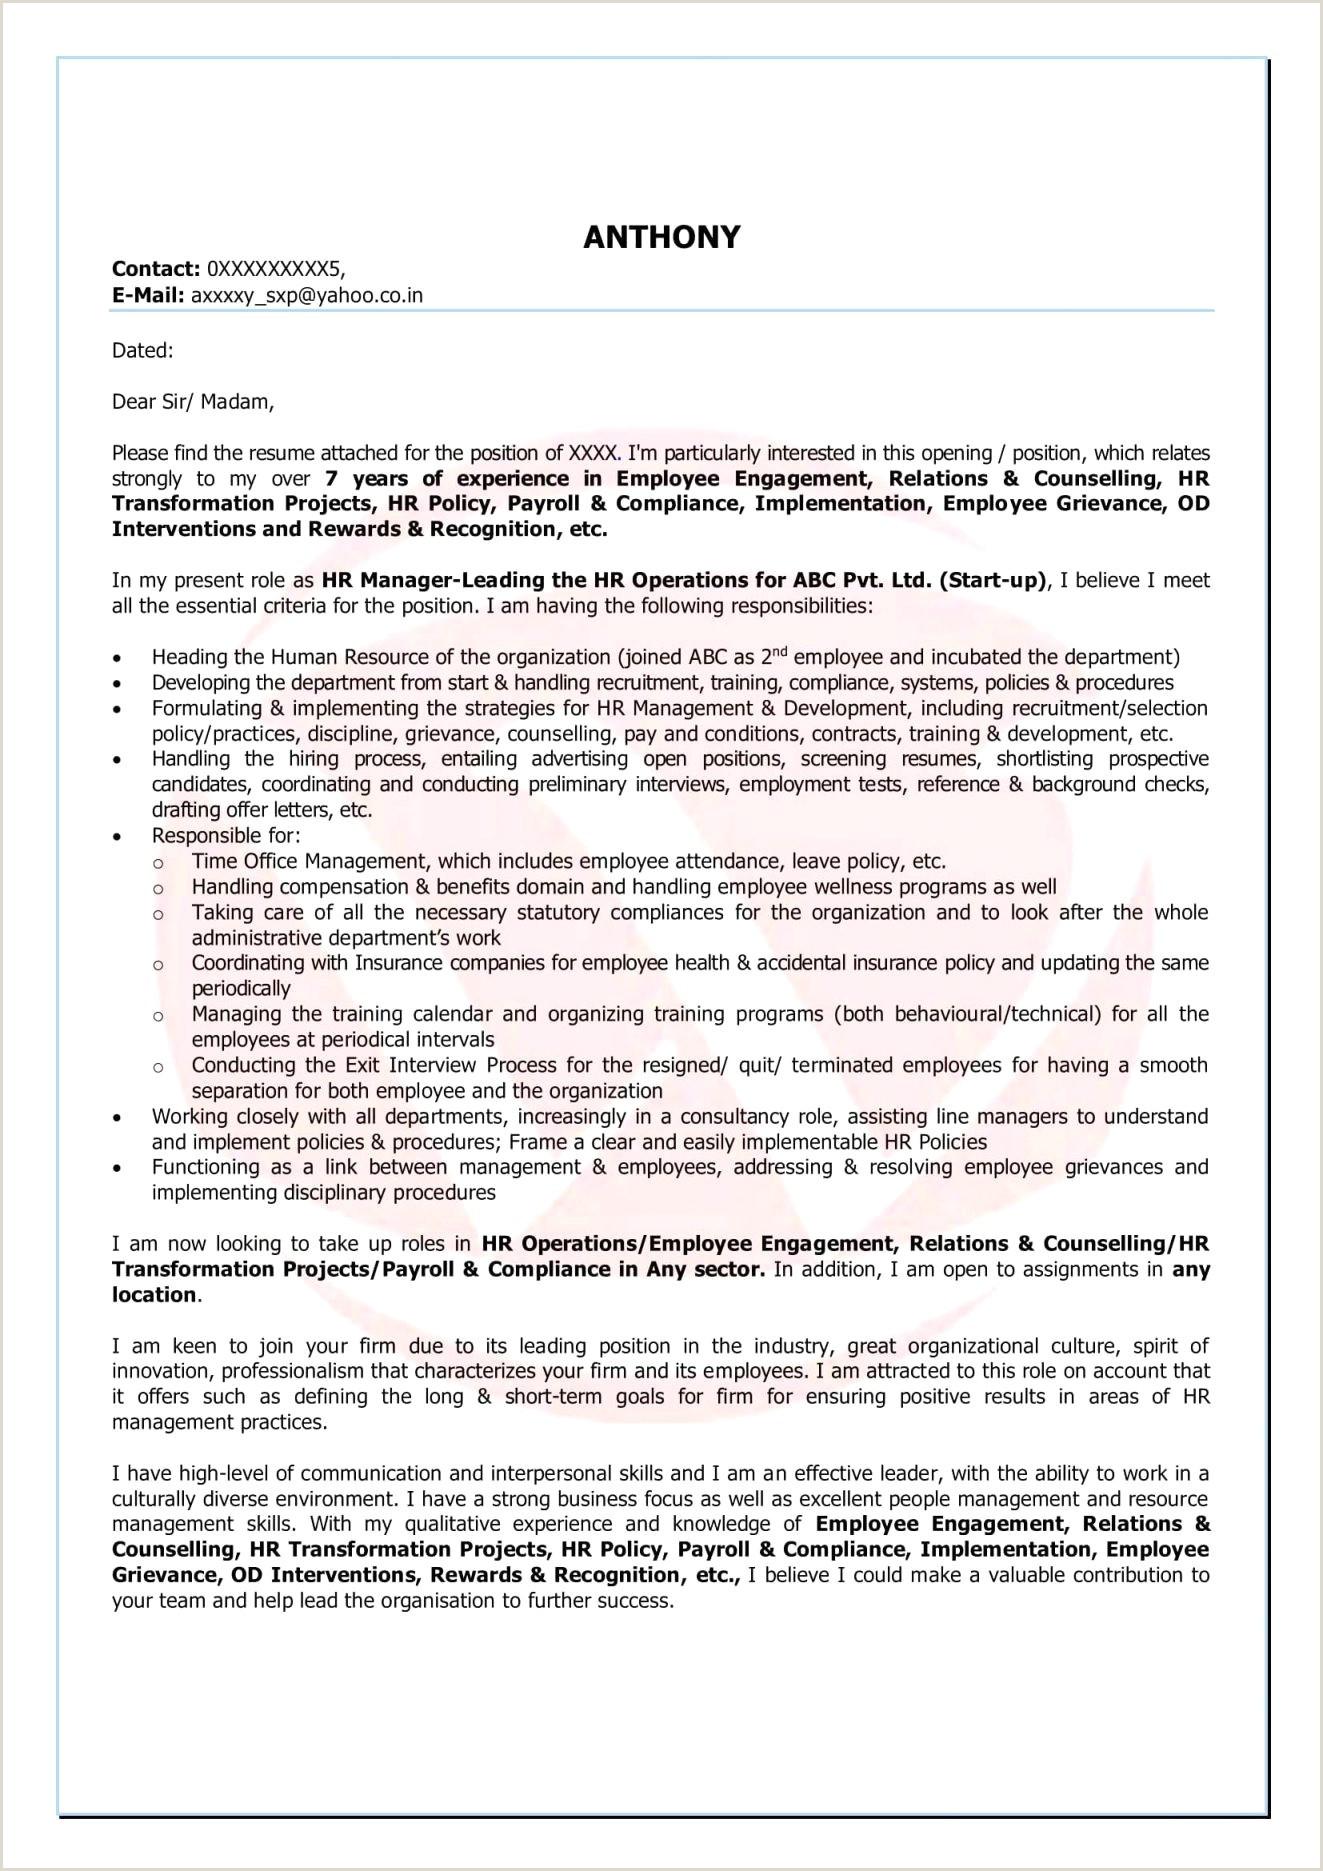 Formato De Curriculum Vitae Para Rellenar En Linea Curriculum Vitae Para Rellenar En Espa±ol šnico Curriculumvt